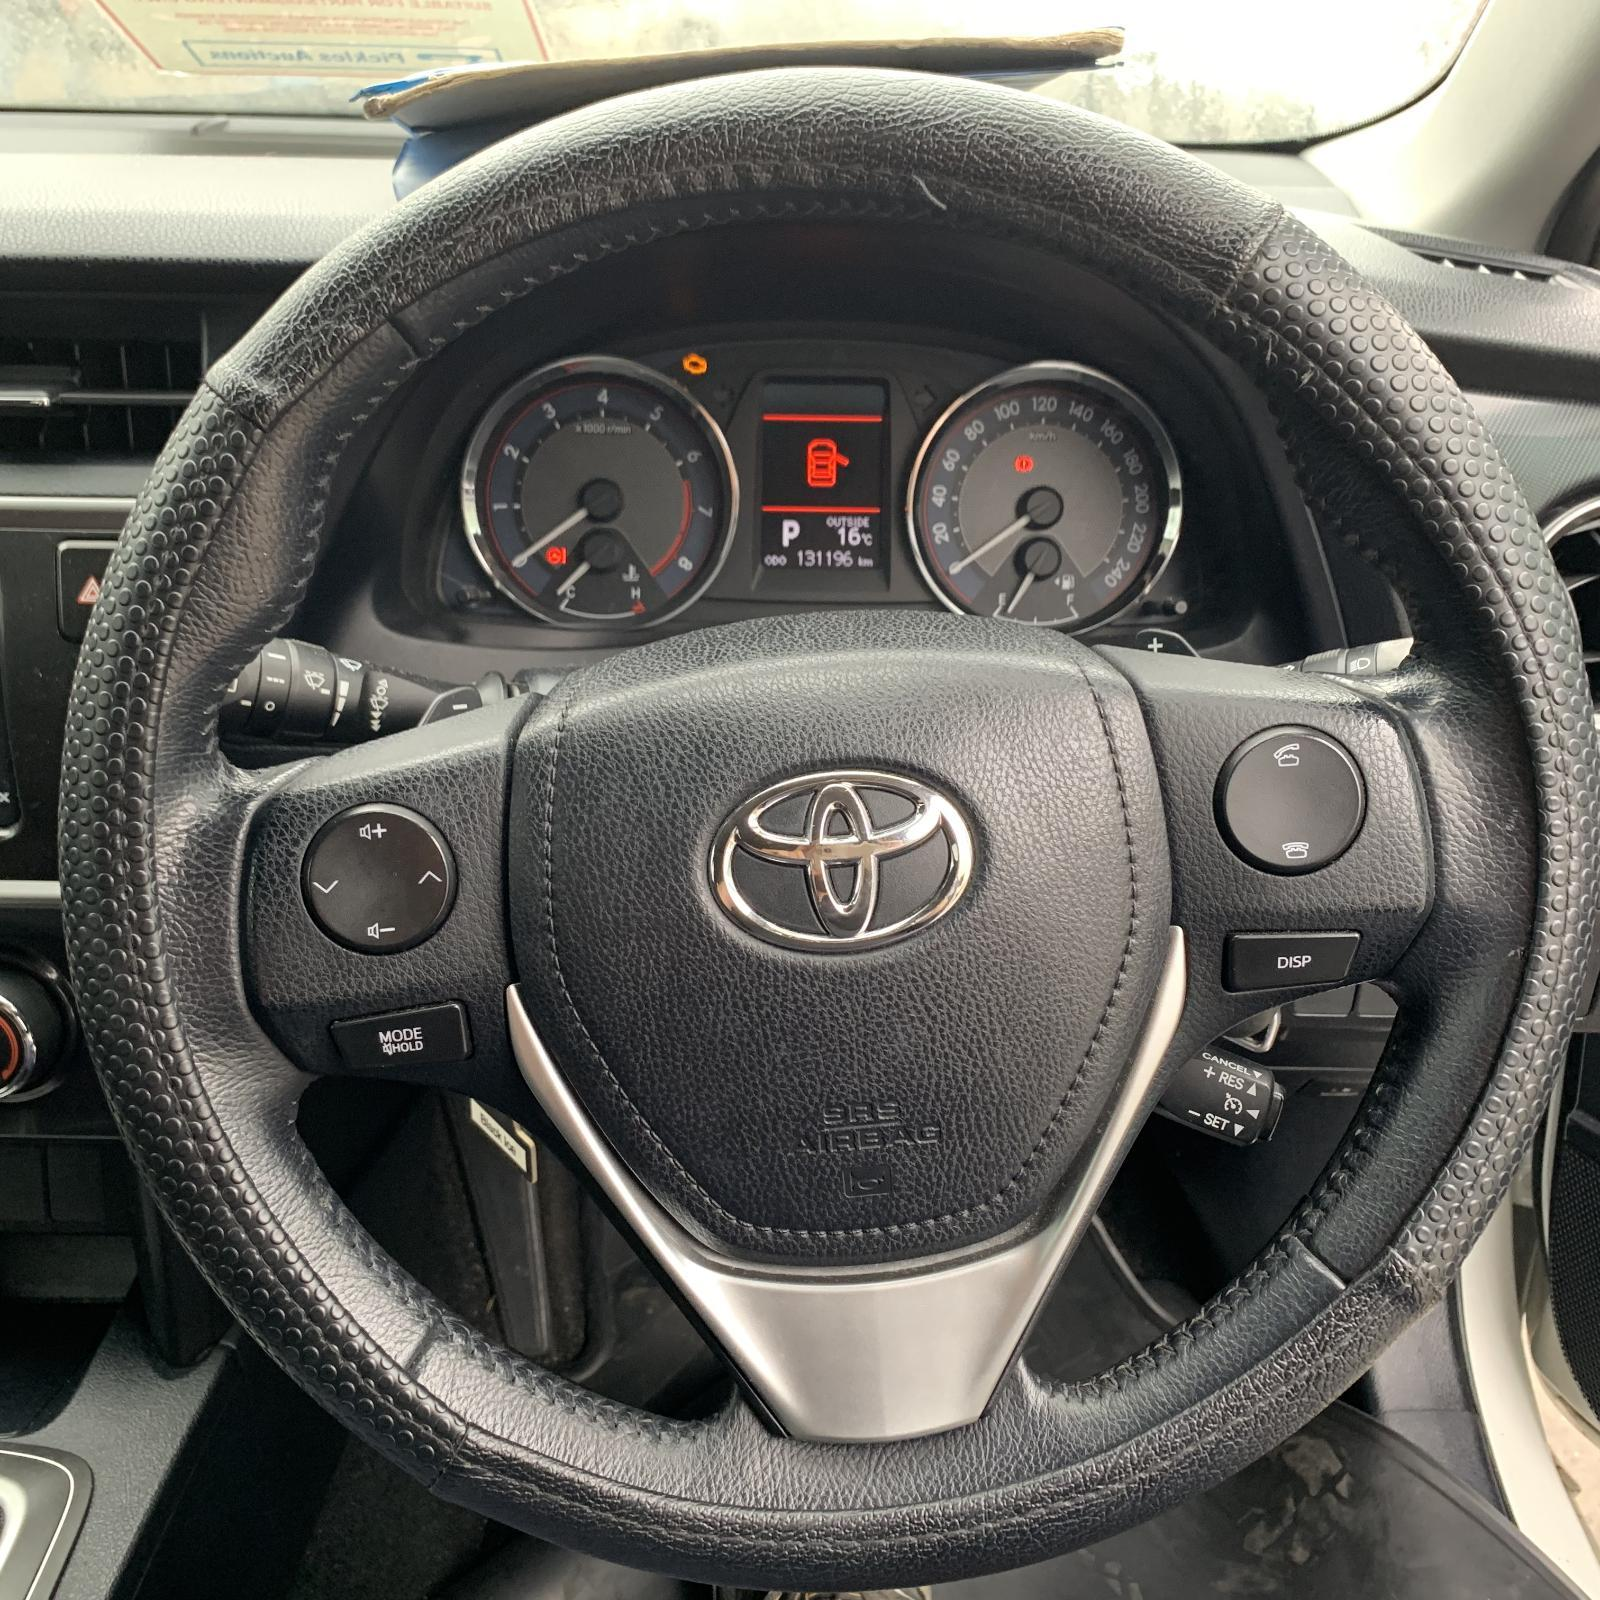 TOYOTA COROLLA, Steering Wheel, LEATHER, ZRE182R, 10/12-